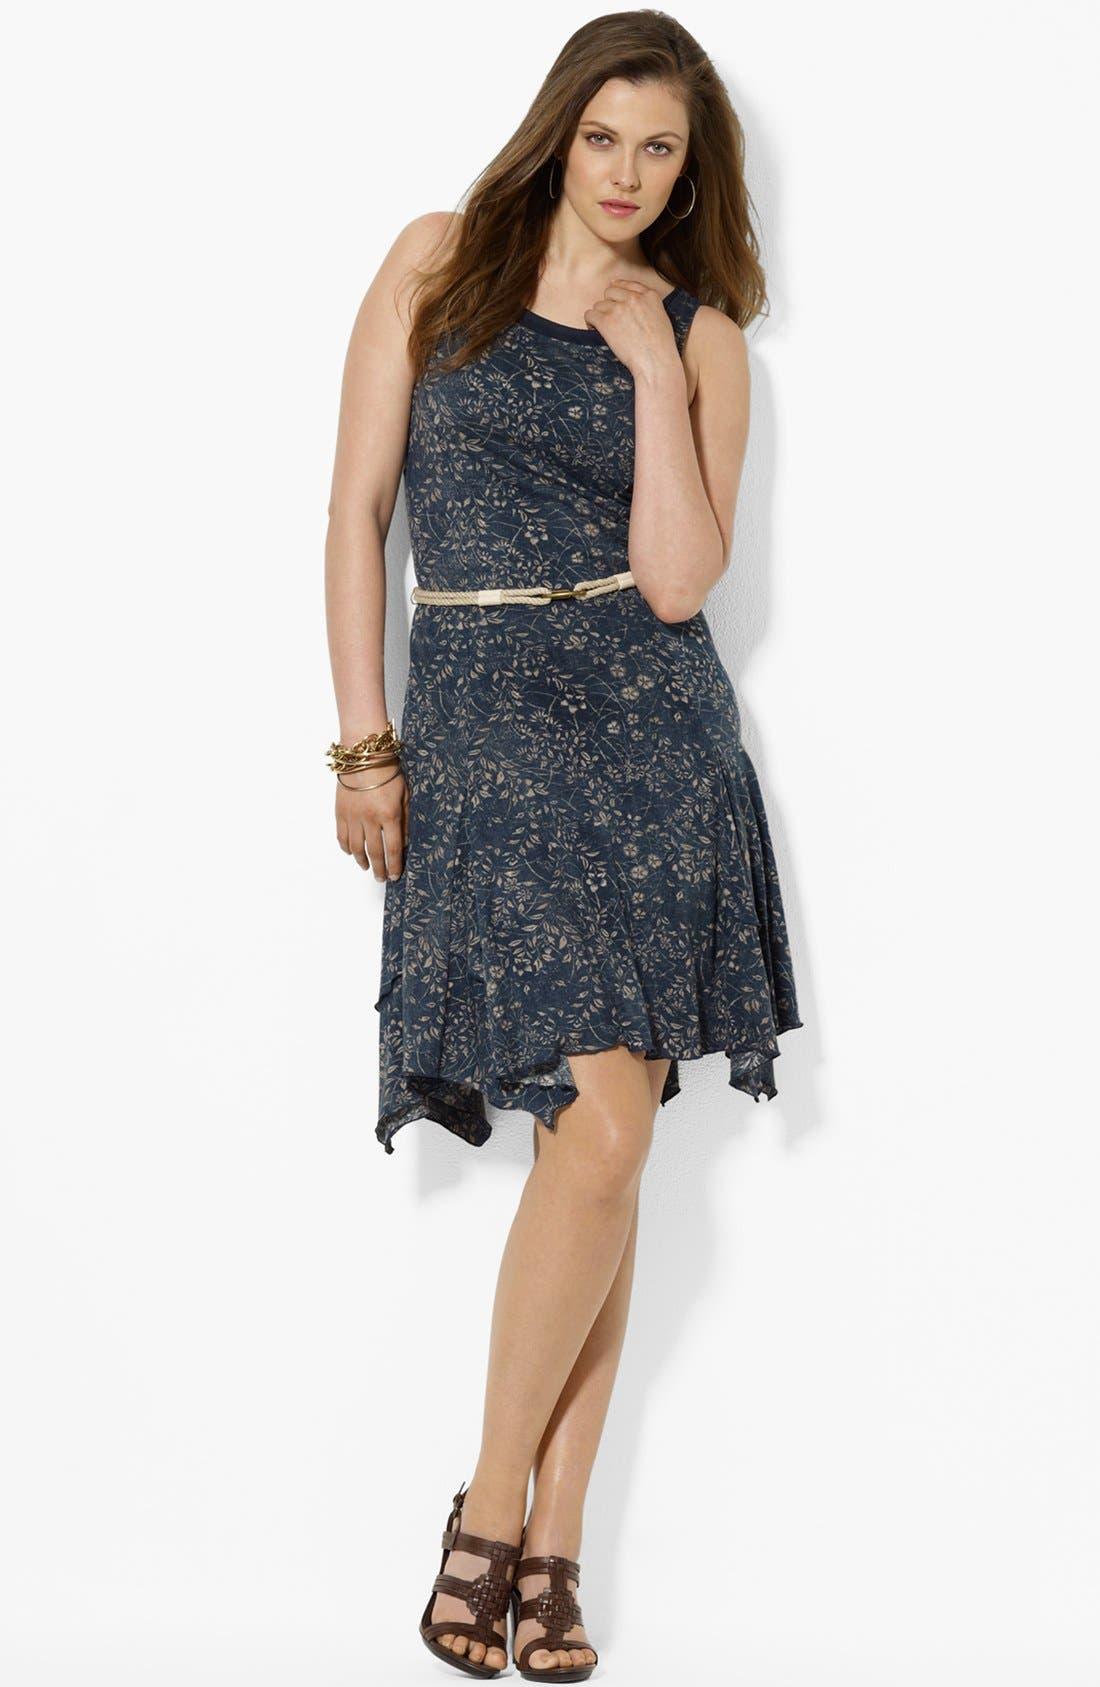 Alternate Image 1 Selected - Lauren Ralph Lauren Print Cotton Tank Dress (Plus Size)